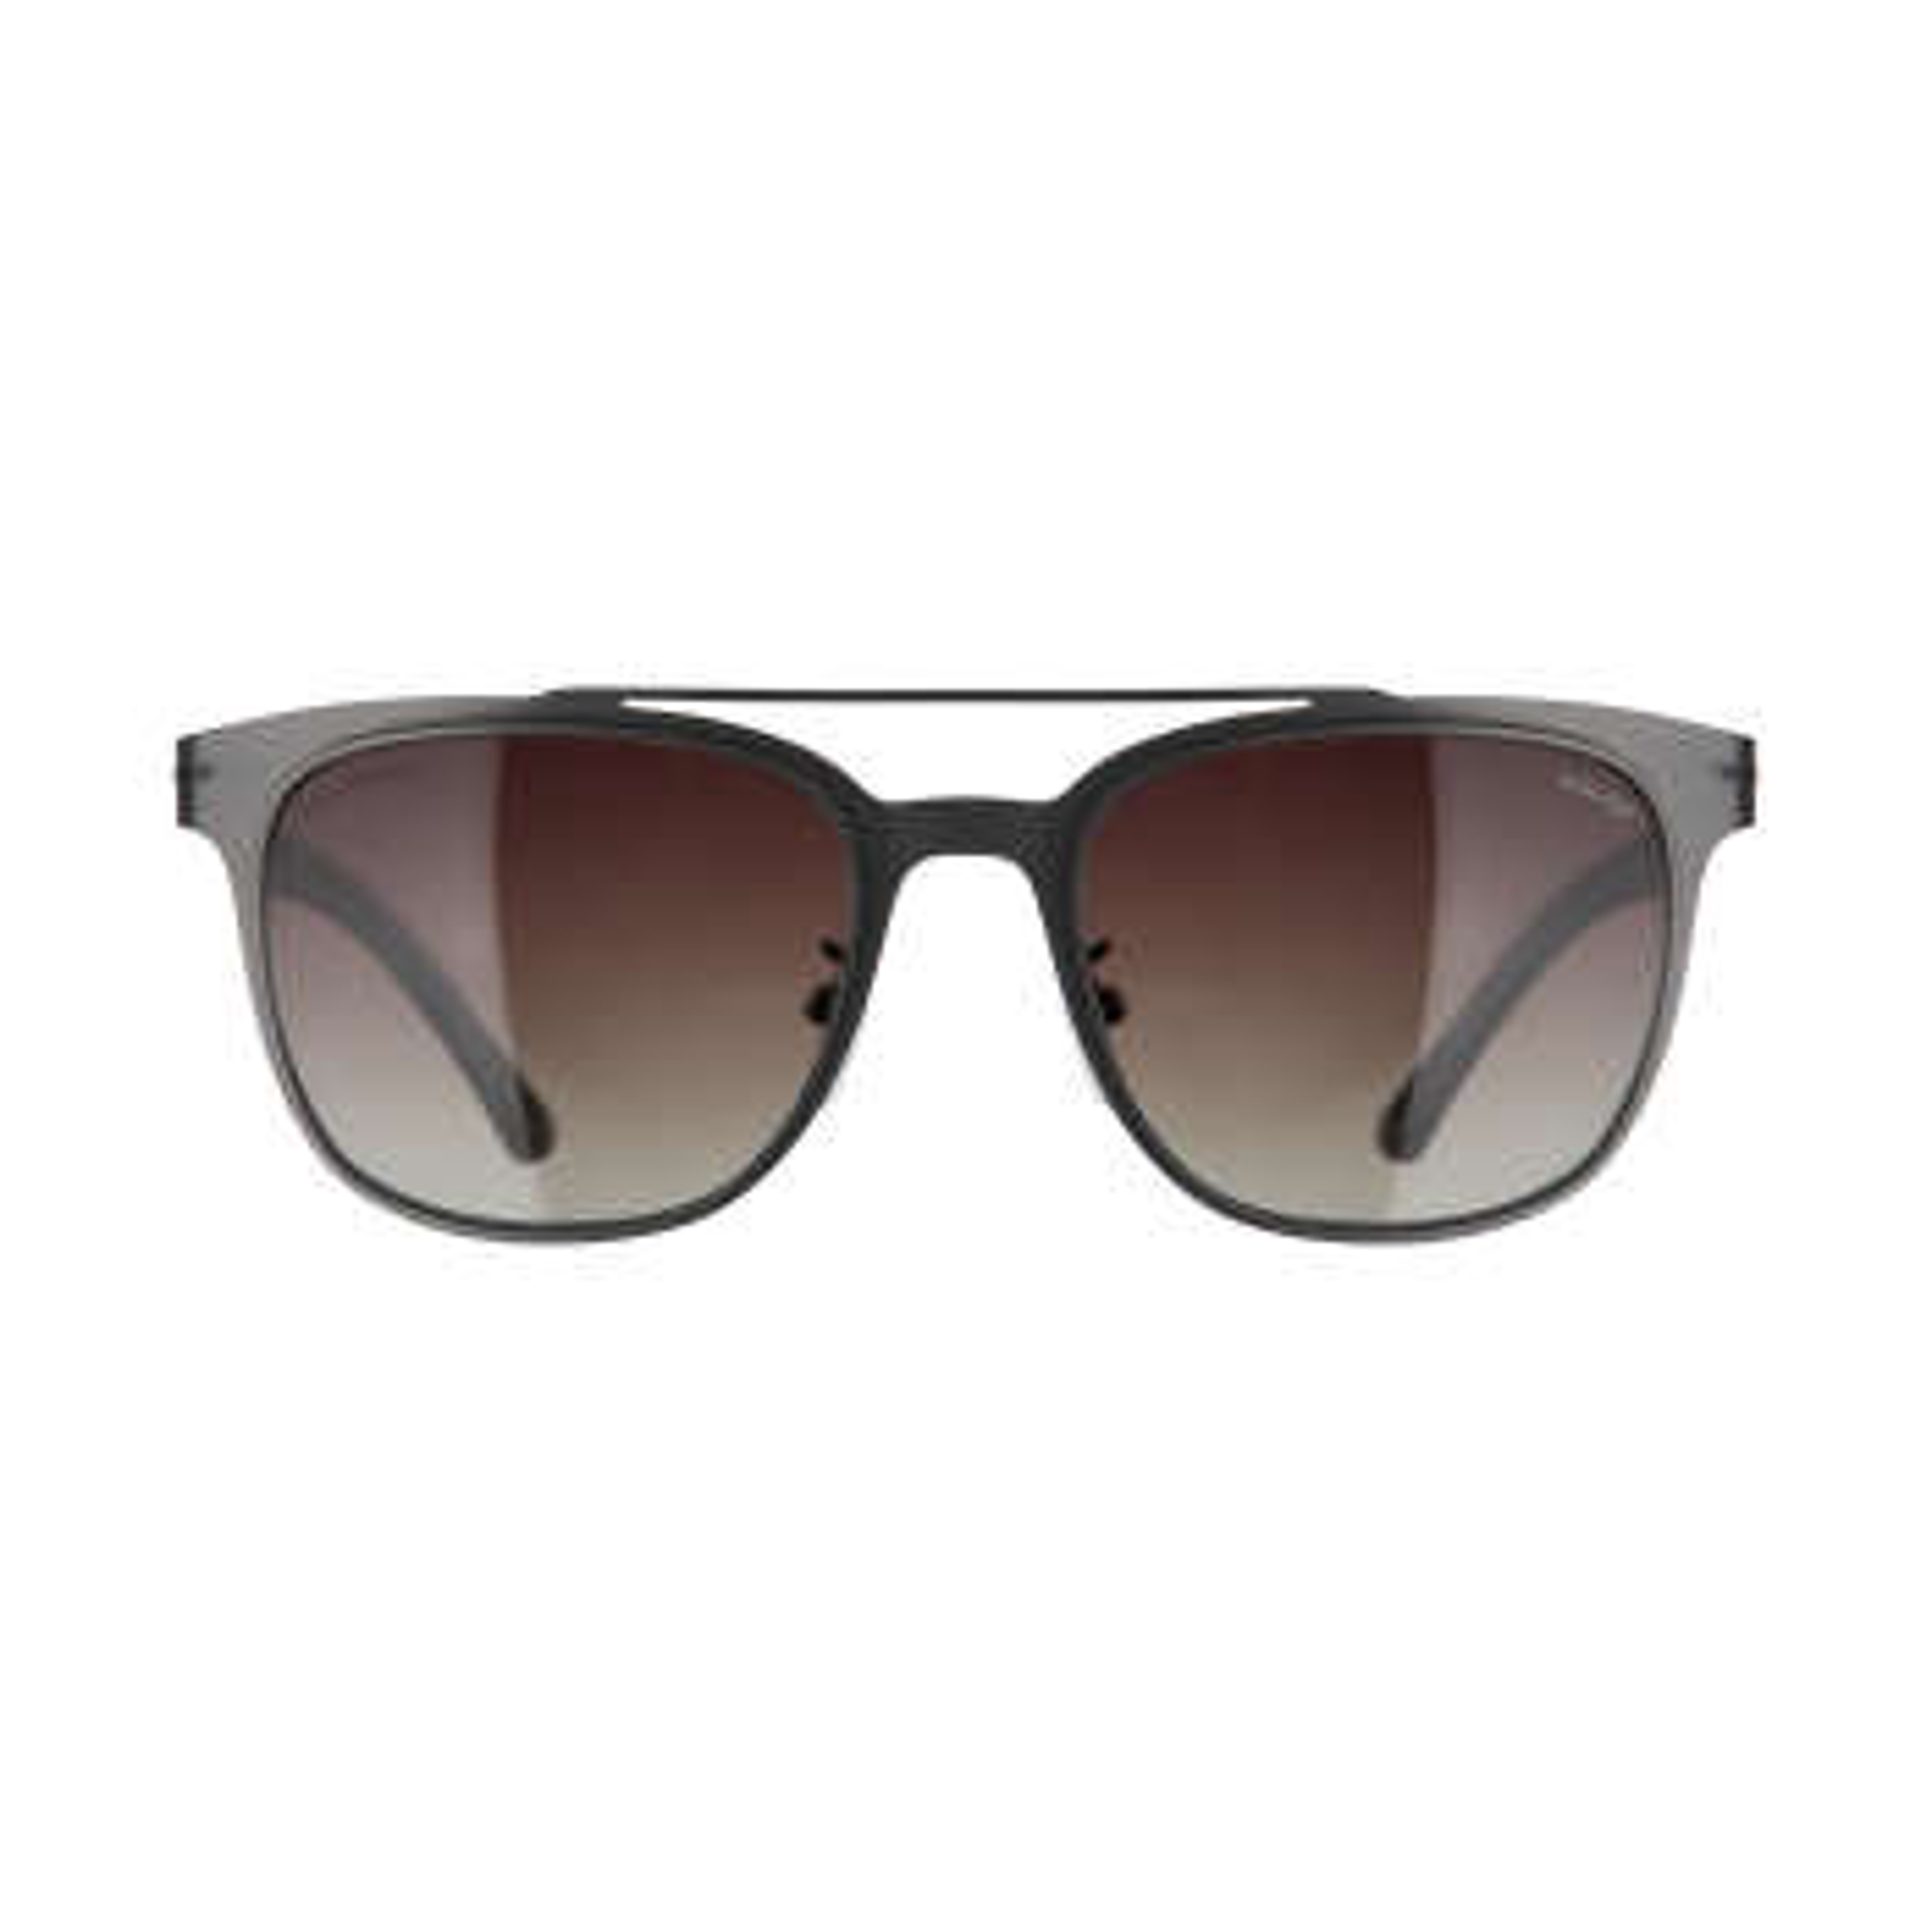 عینک آفتابی پلیس مدل SPL356M 627P